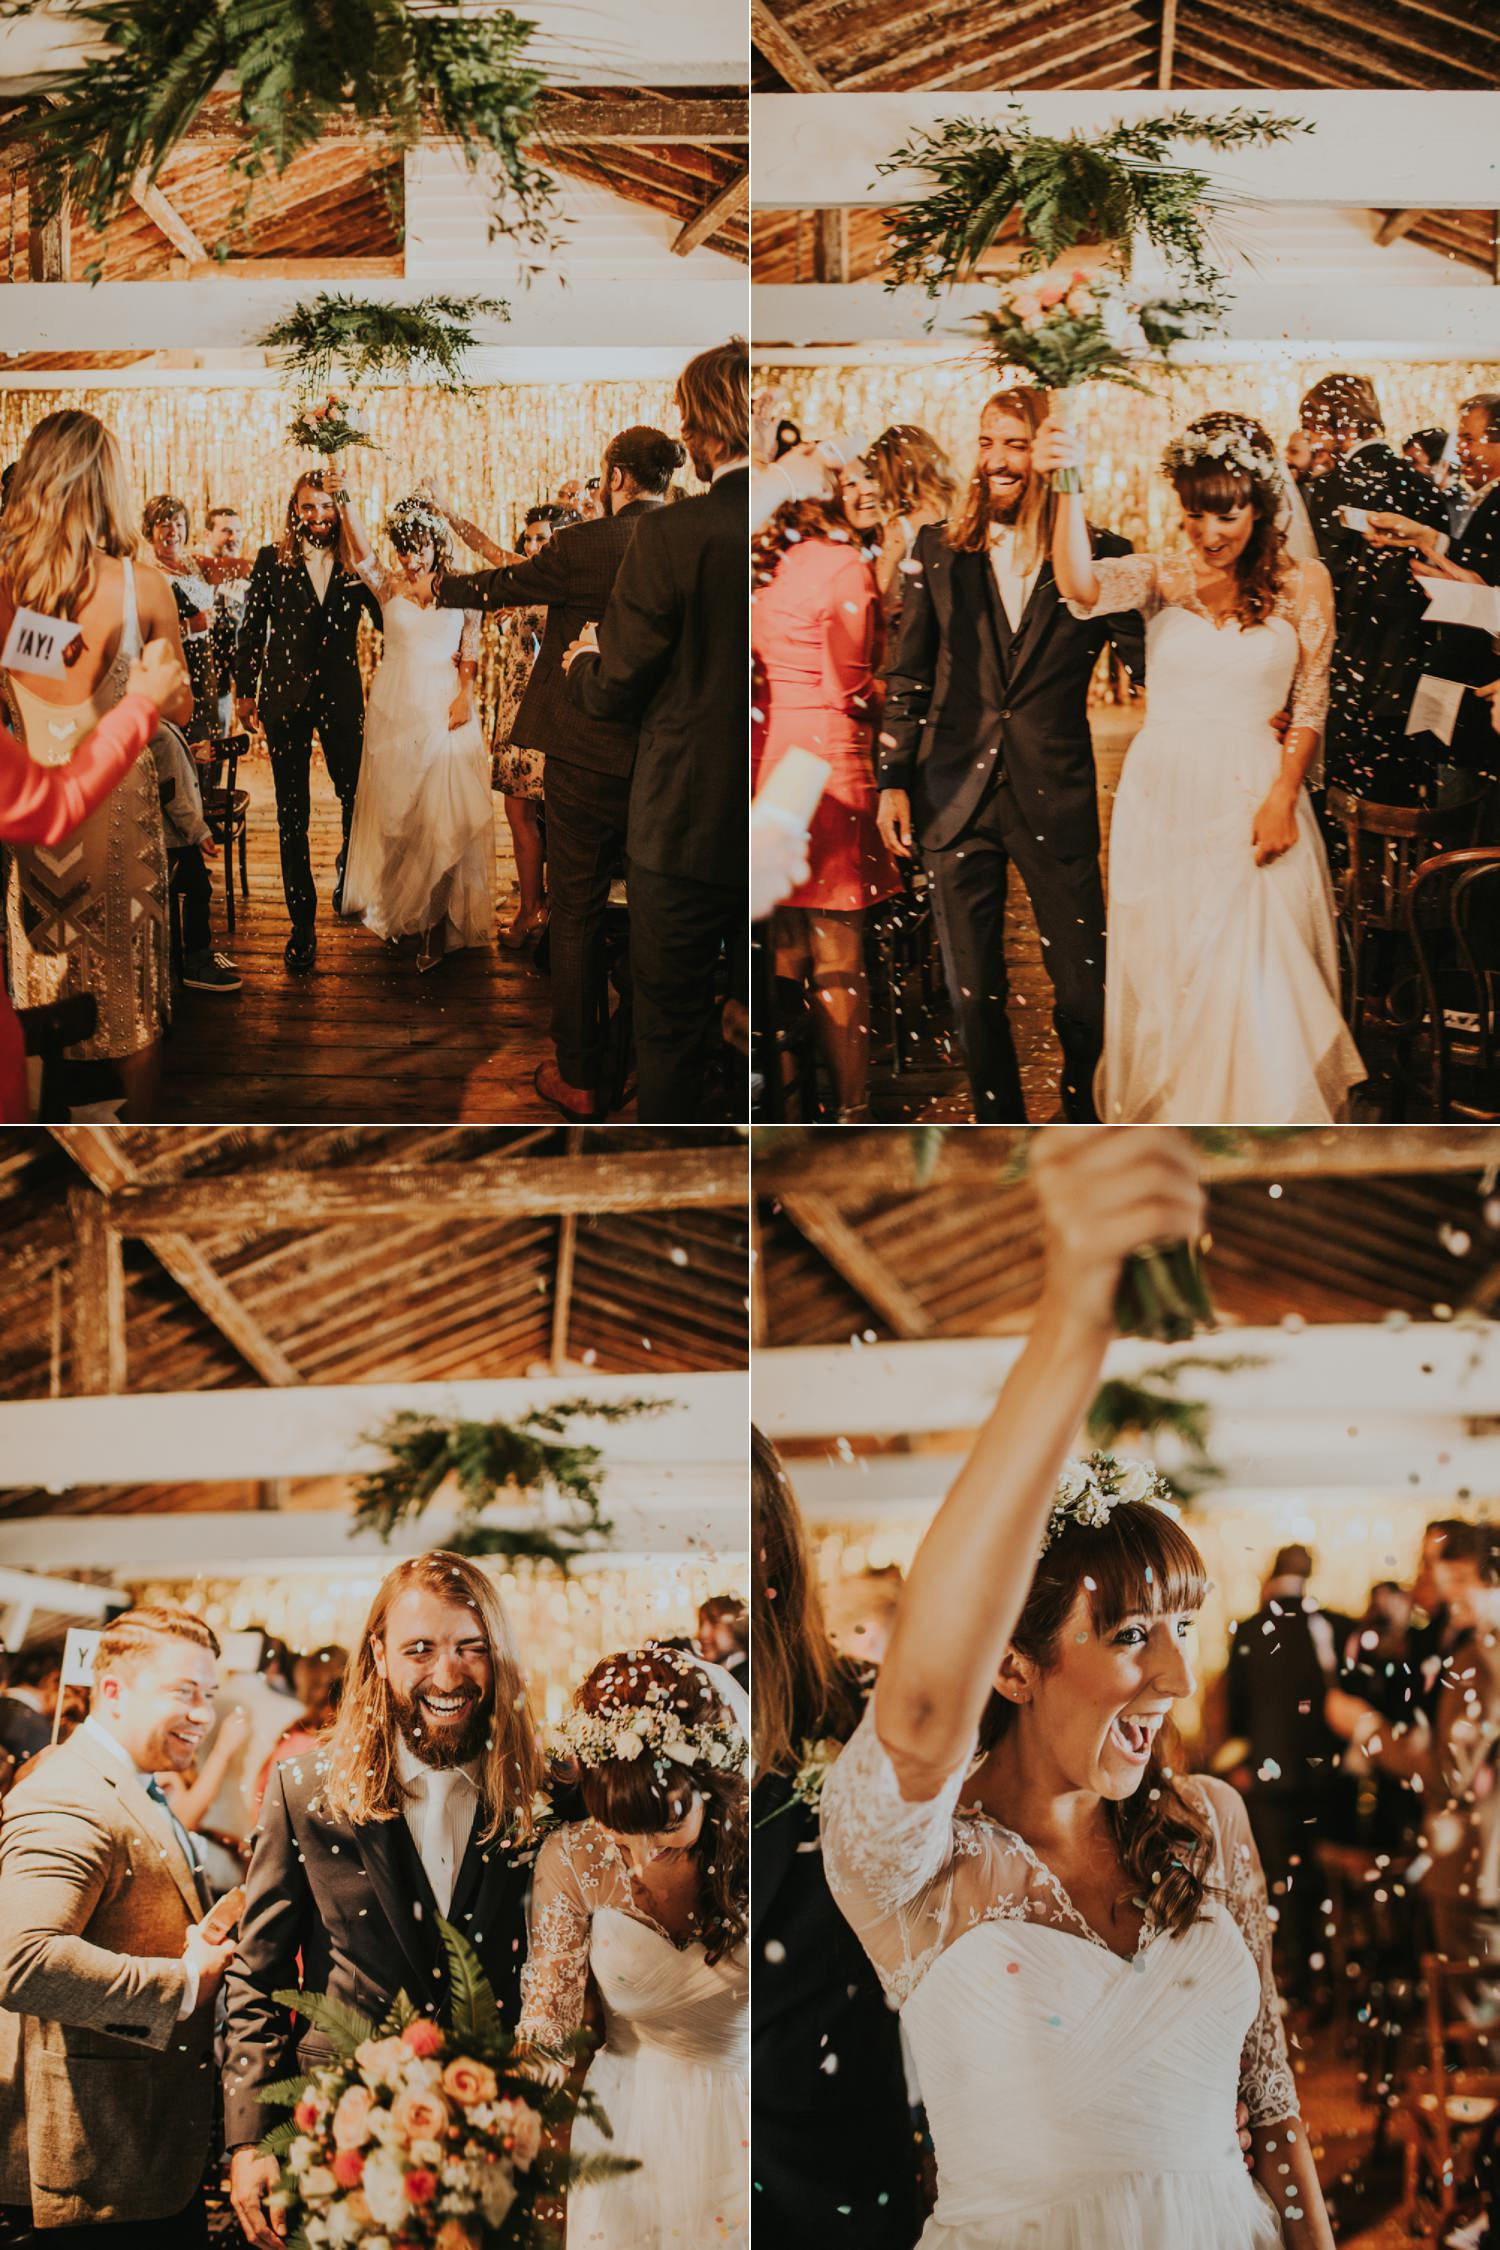 whistable_lobster_shack_wedding_0009.jpg